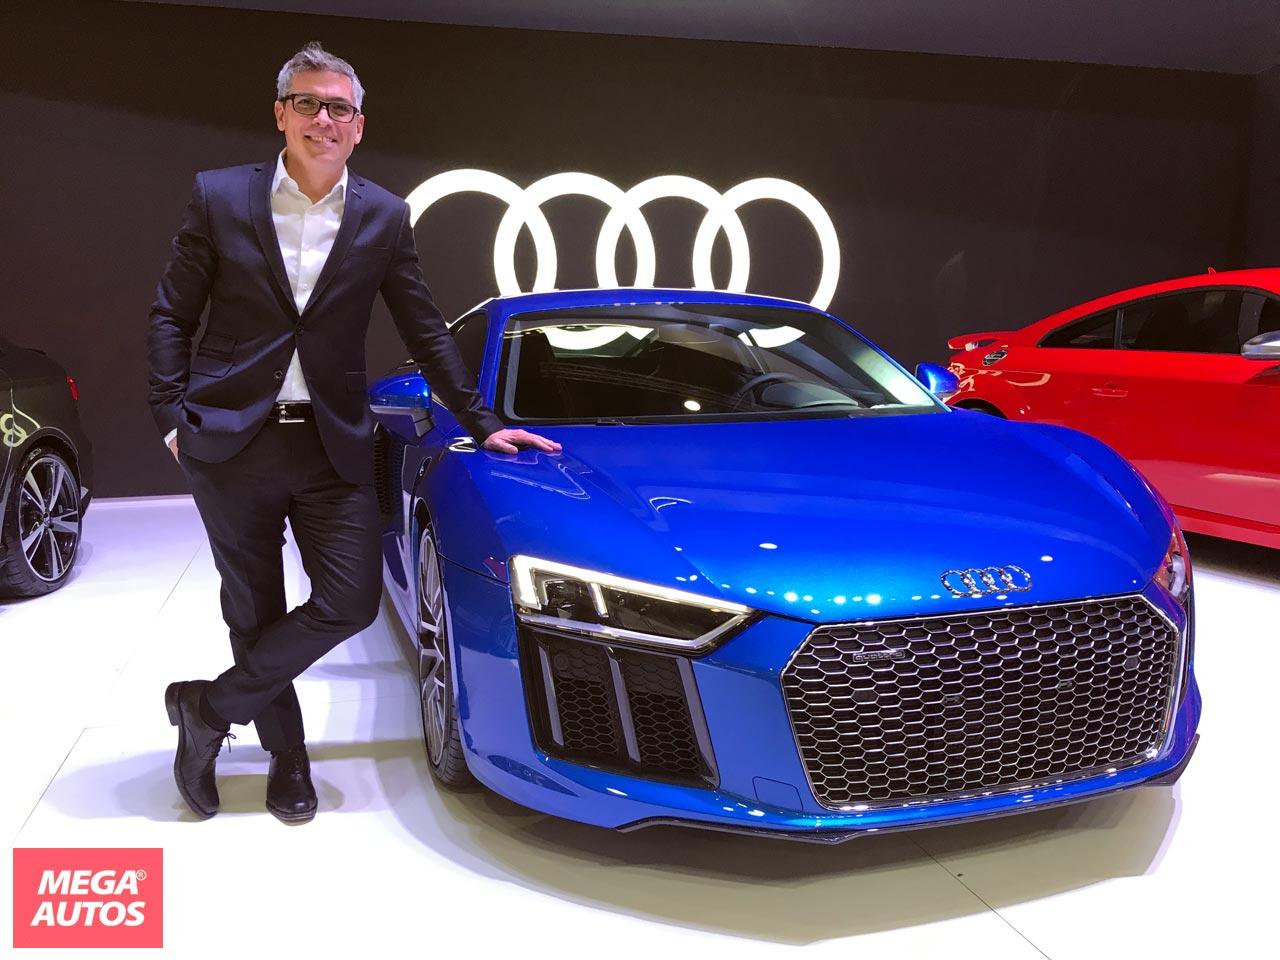 Gonzalo Cassina, Gerente de Marketing de Audi Argentina, junto al R8 V10 Plus.